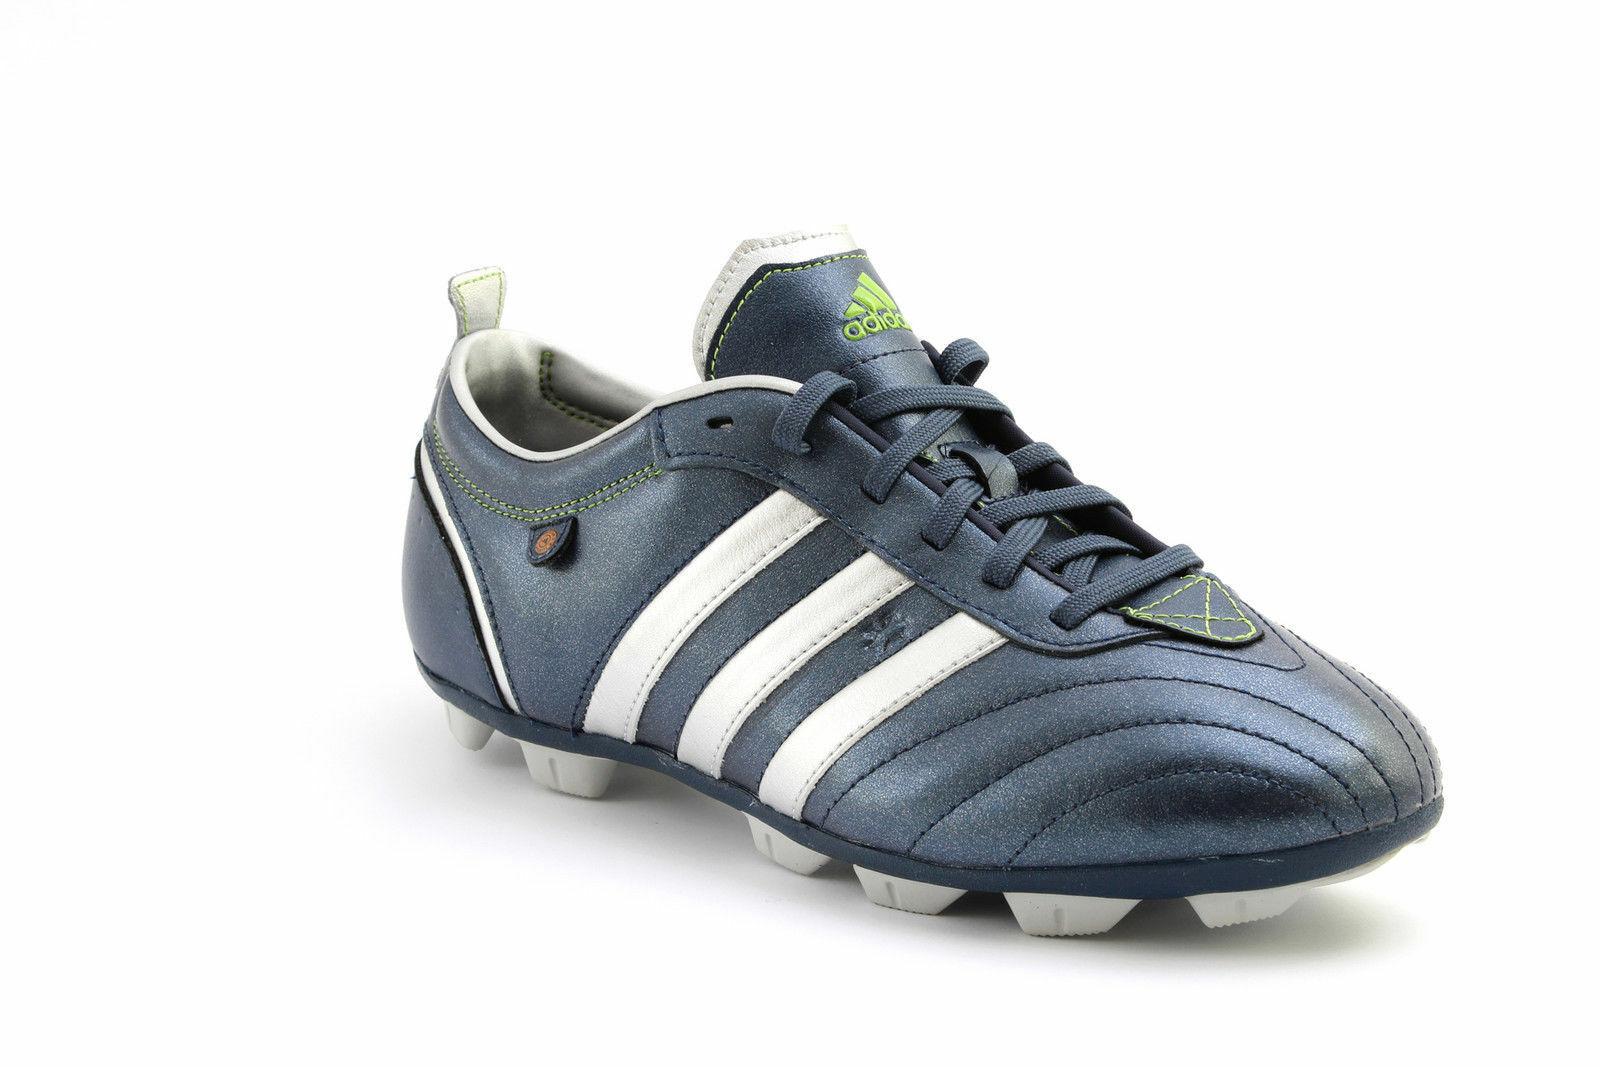 scarpe calcio adidas originali